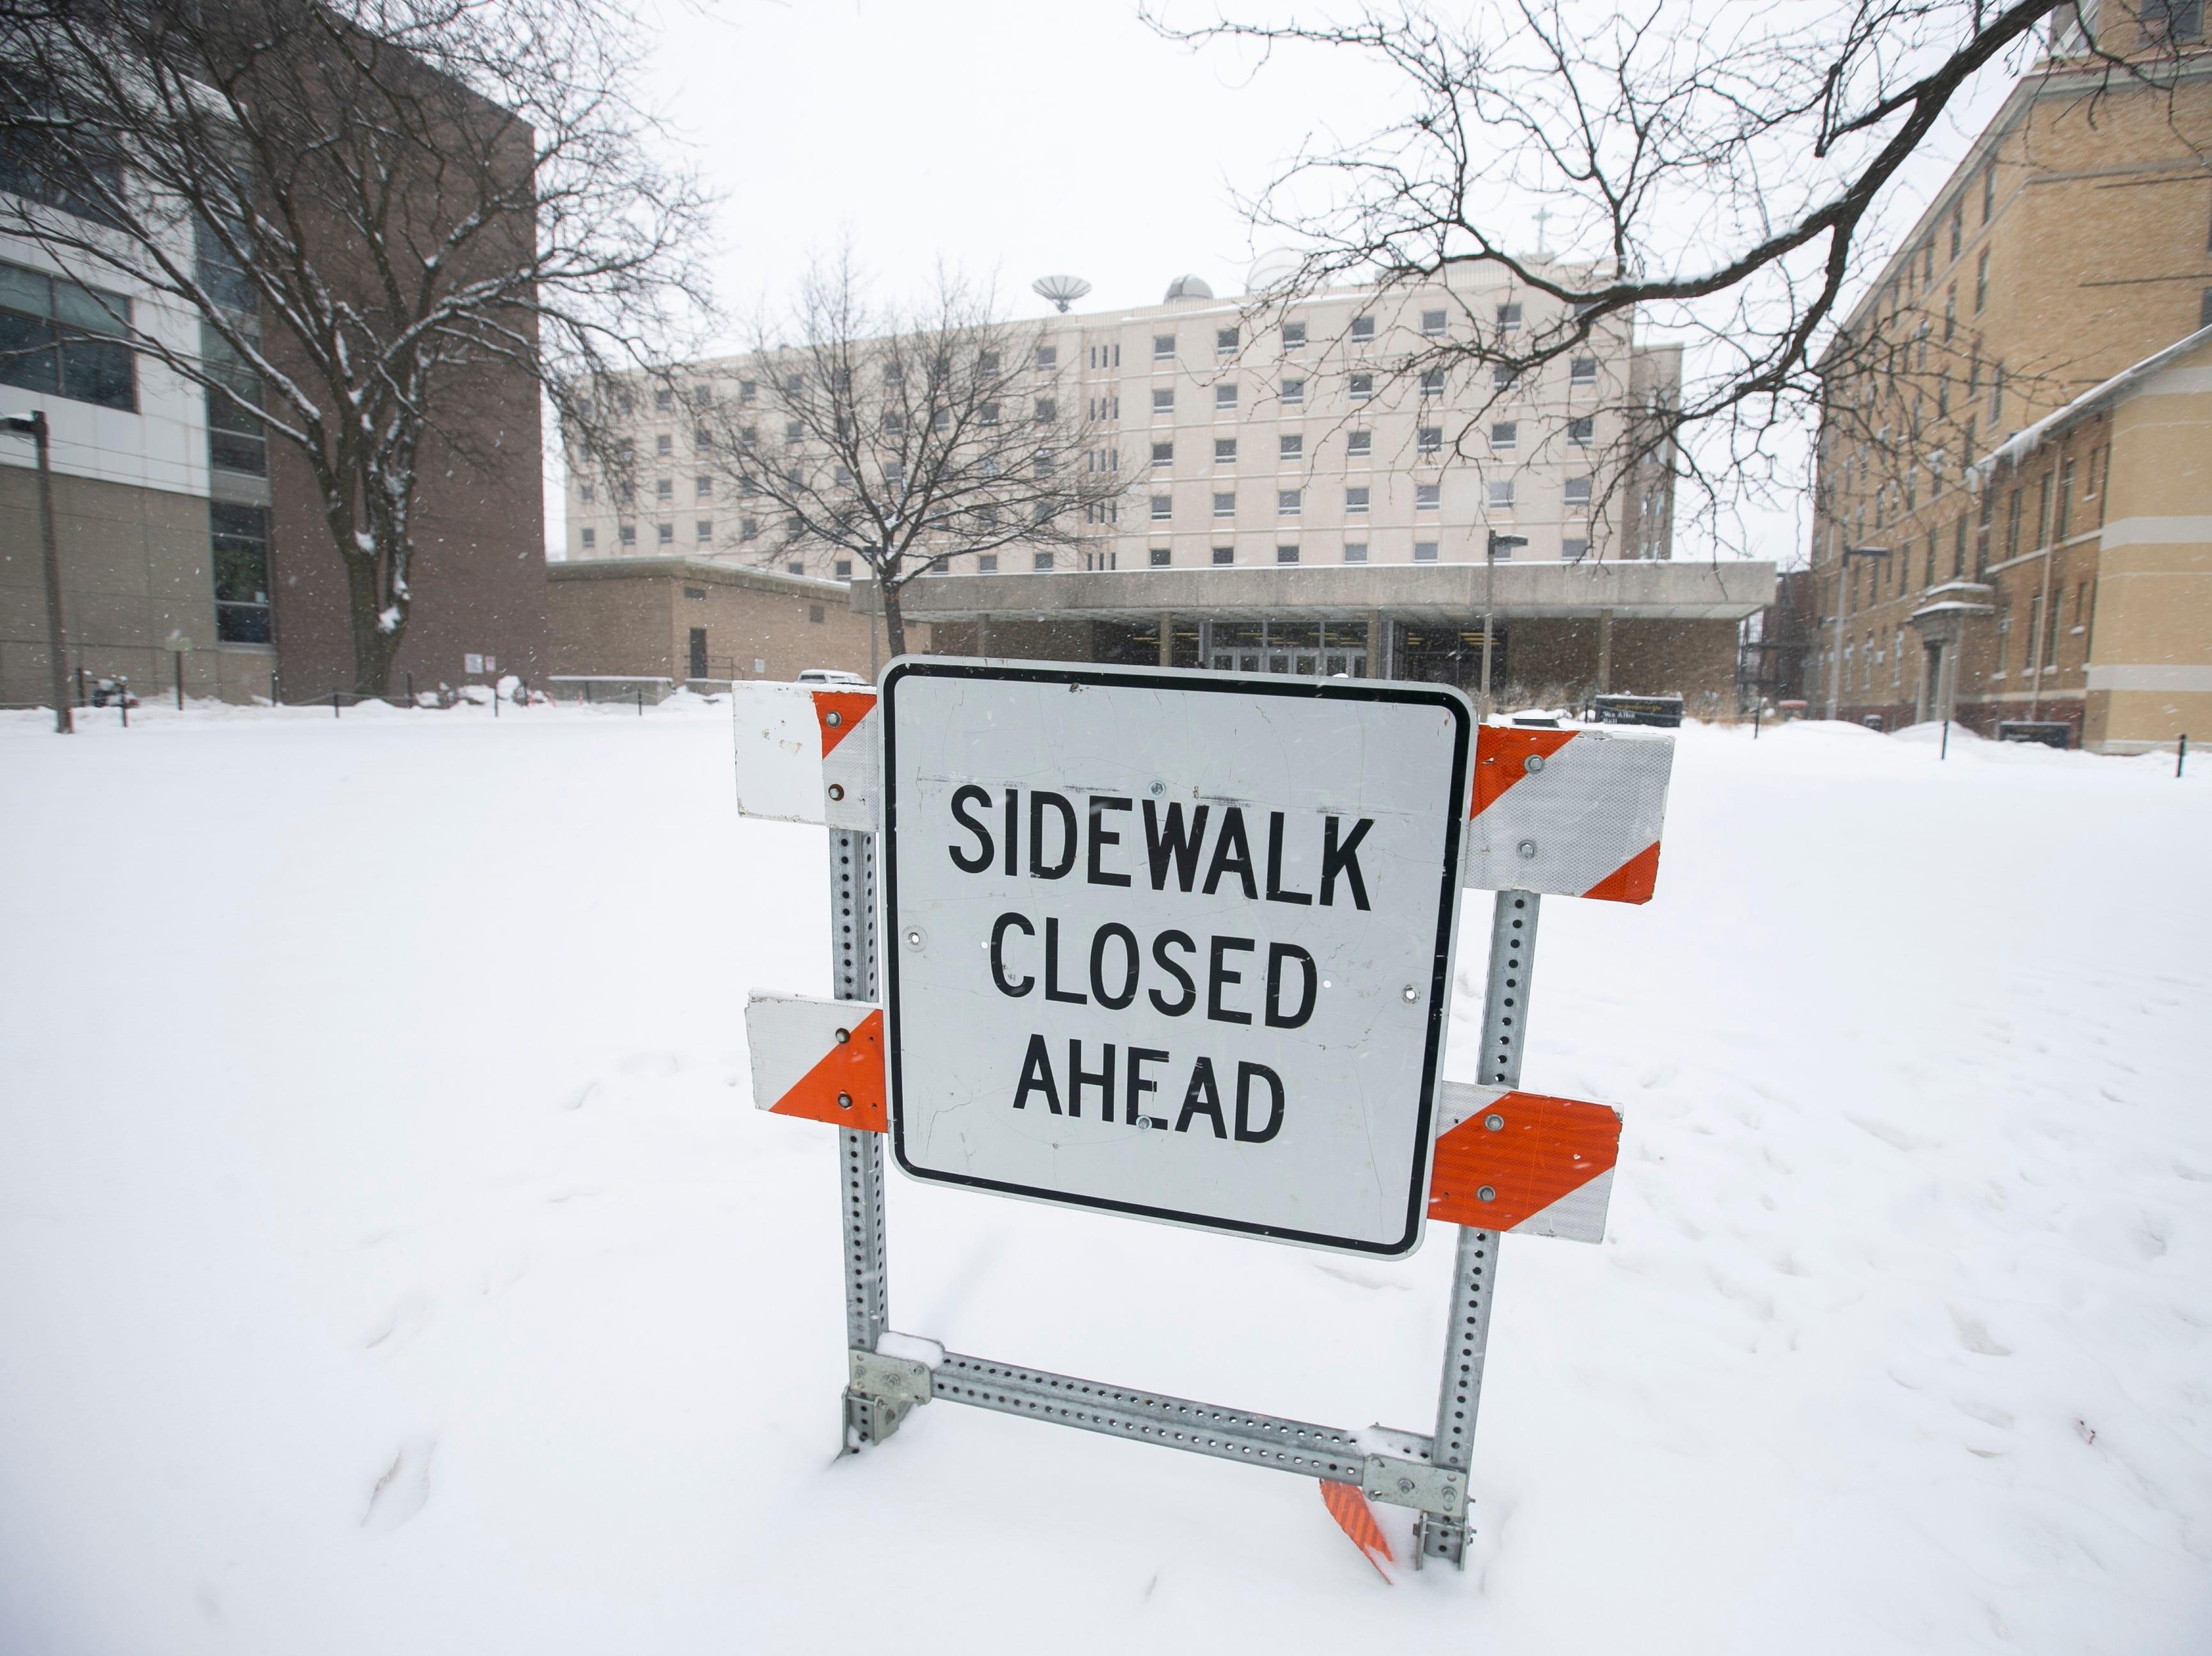 A sign along Iowa Avenue is seen as snow falls on Thursday, Jan. 31, 2019, in downtown Iowa City, Iowa.